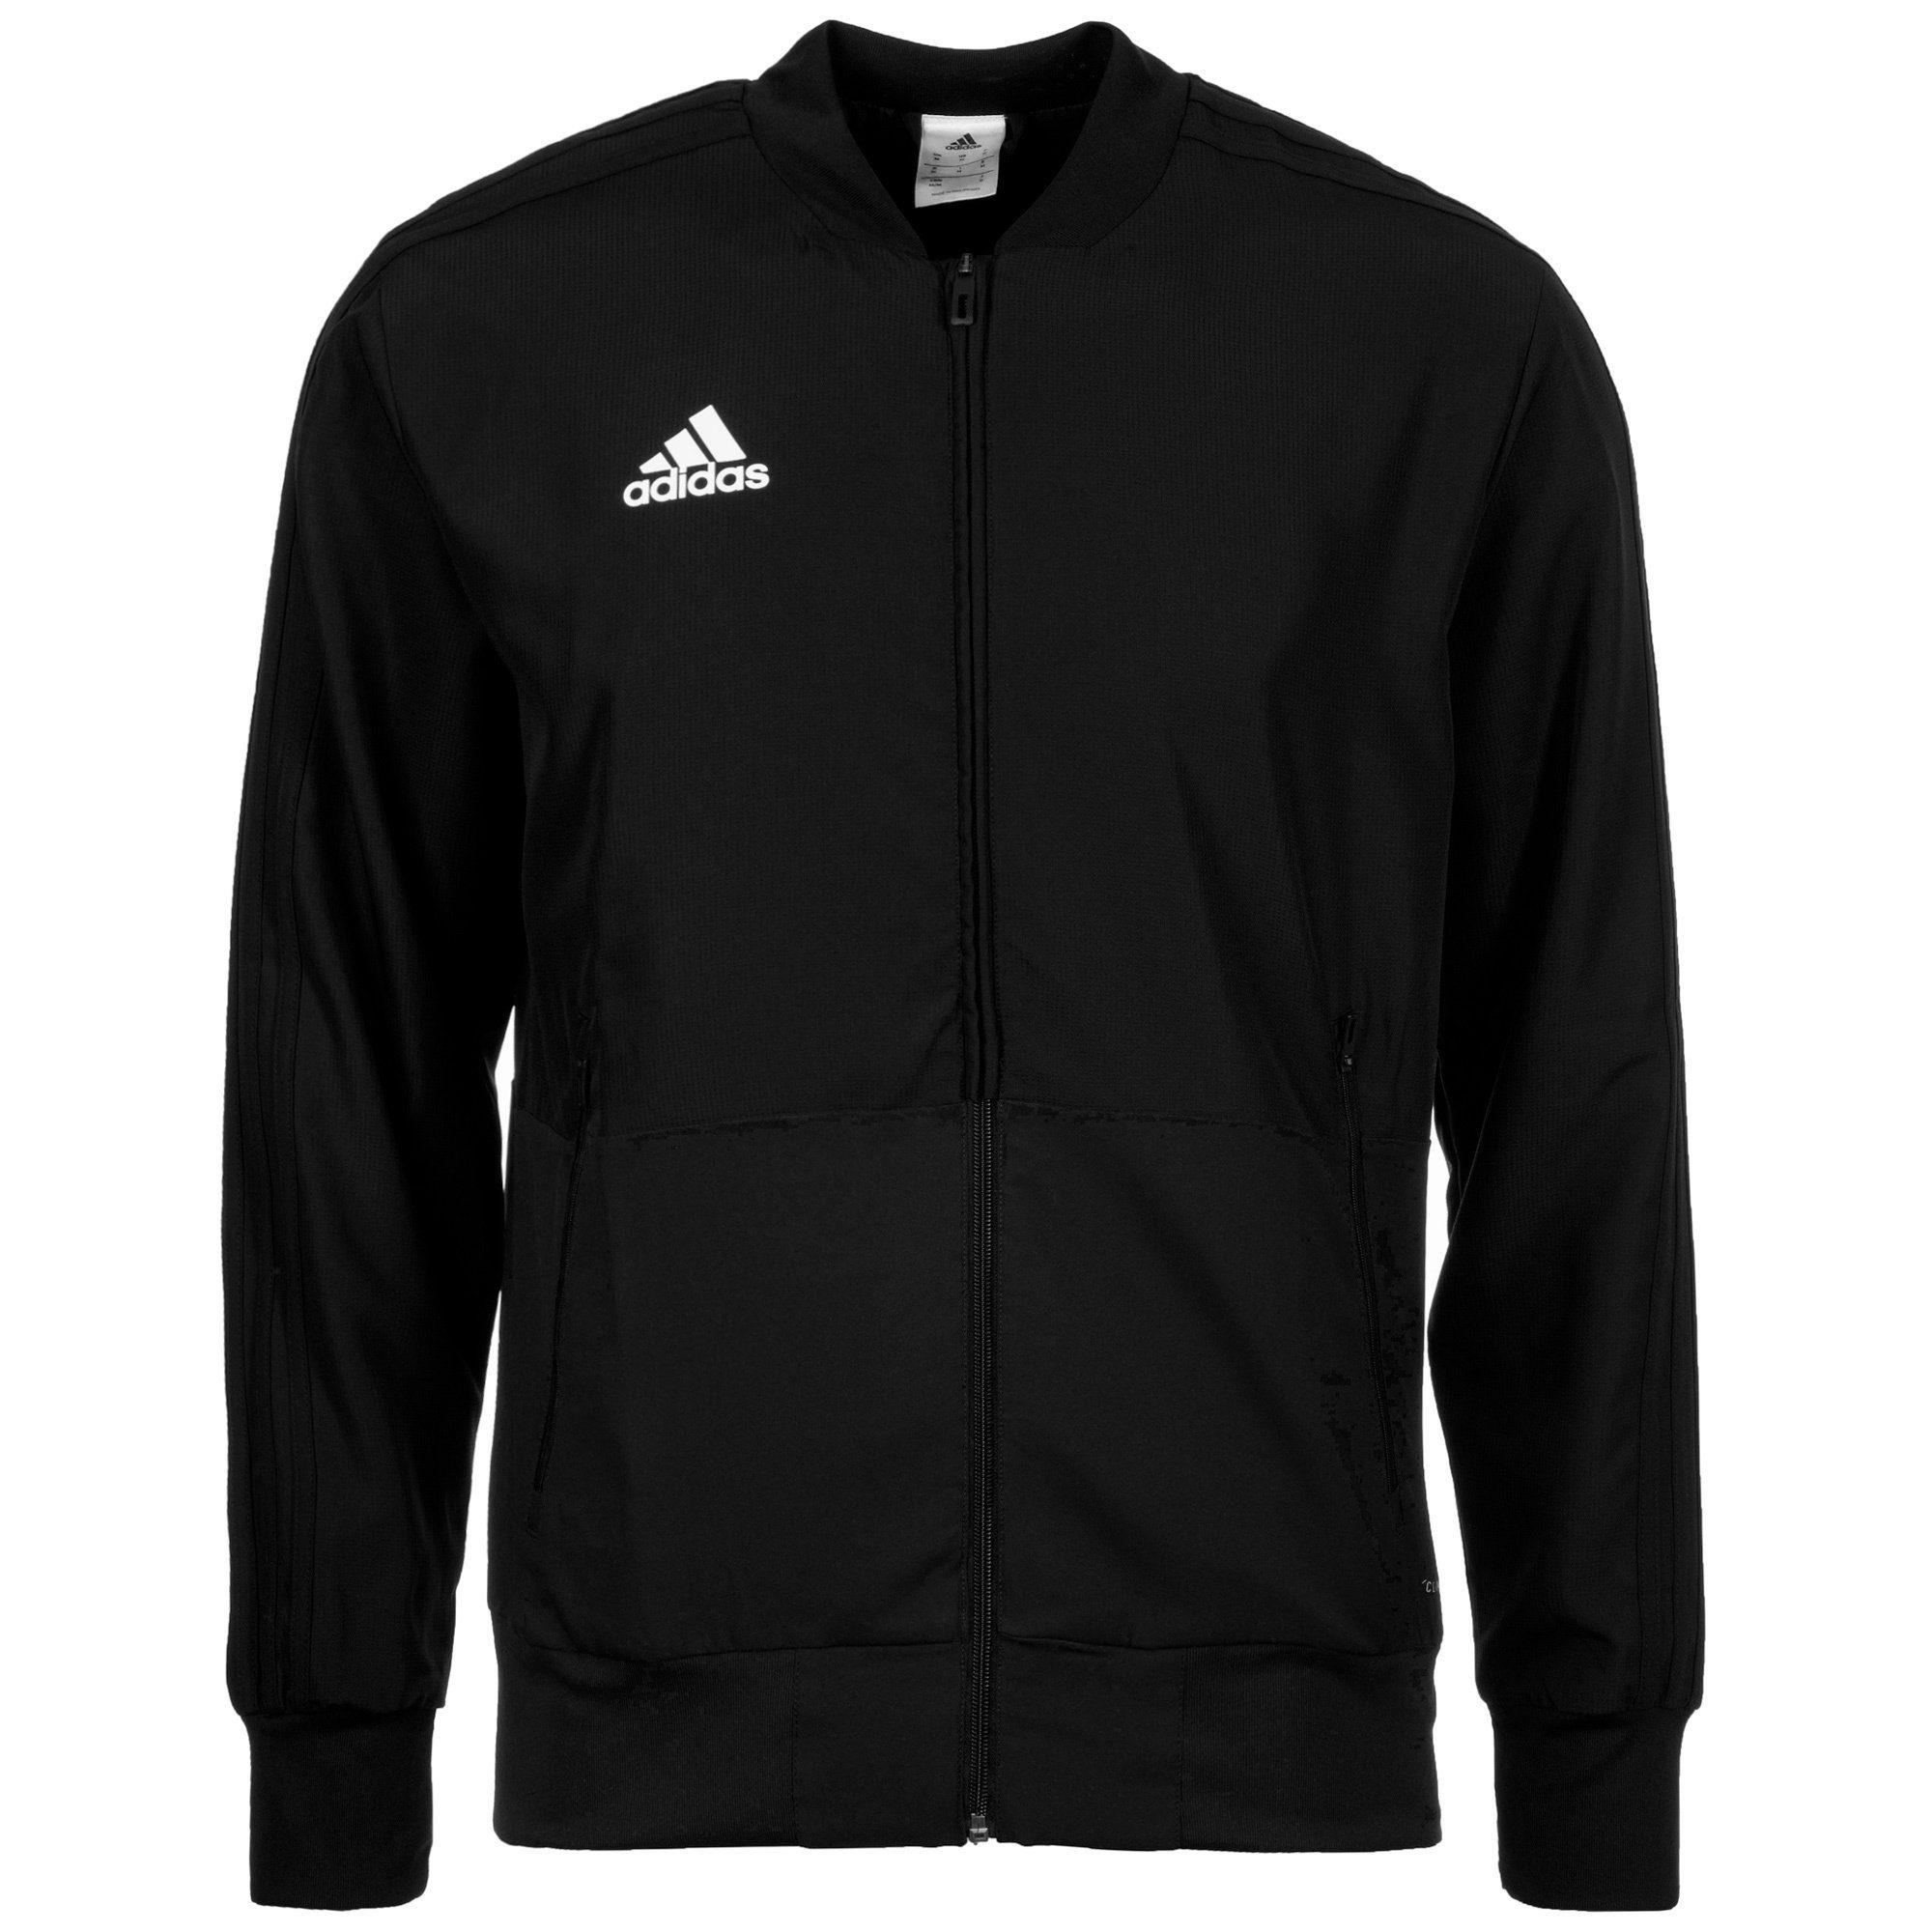 adidas Performance Trainingsjacke Condivo 18 | Sportbekleidung > Sportjacken | Schwarz | Adidas Performance